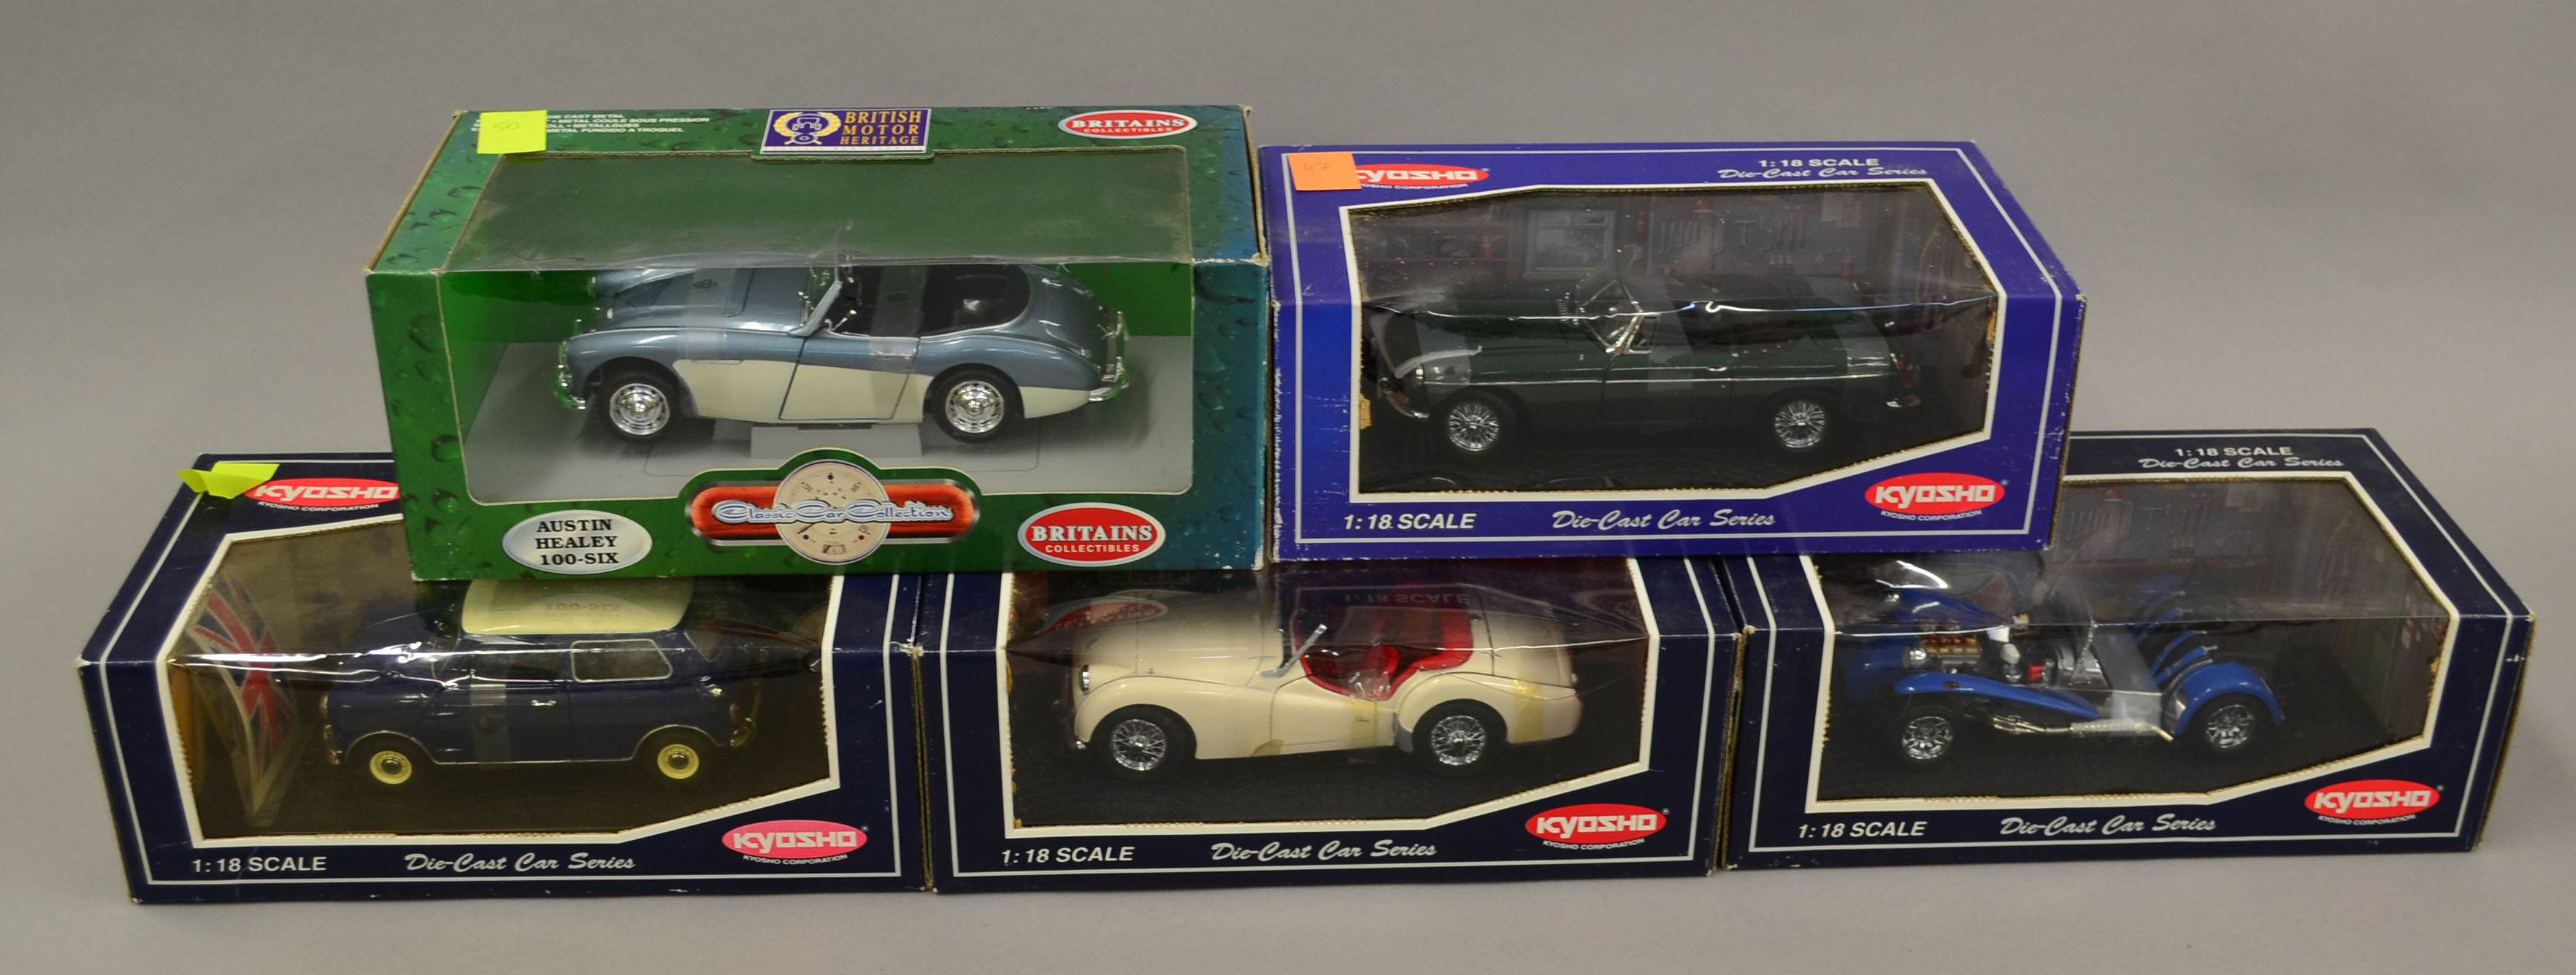 Five 1 18 Scale Die Cast Model Cars Ertl Britains Austin Healey